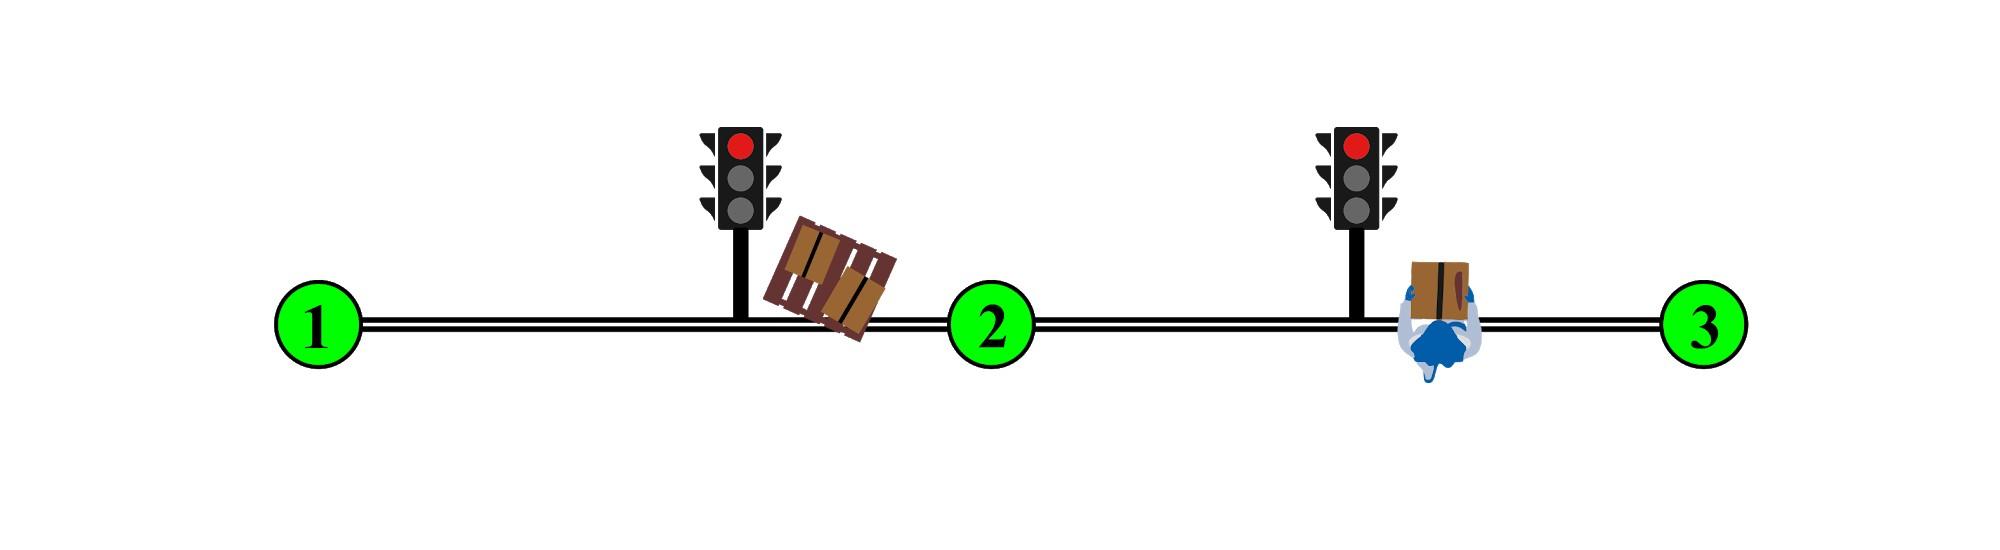 AGV-diagram1